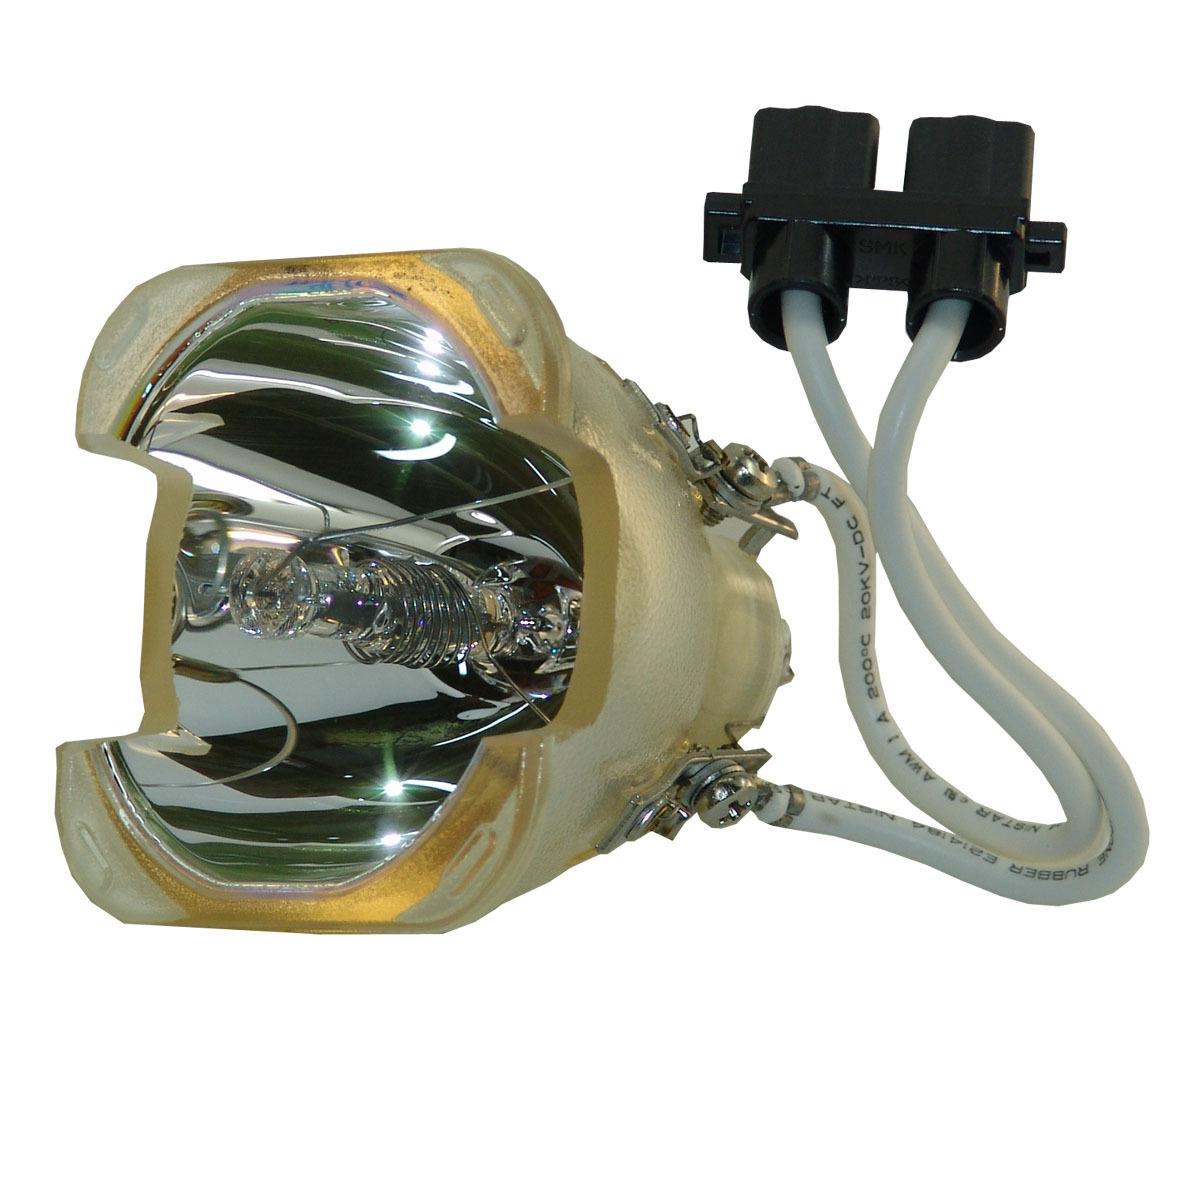 Bombilla Compatible EC. J0901.001 para Acer PD725/PD725P bombilla para proyector sin carcasa